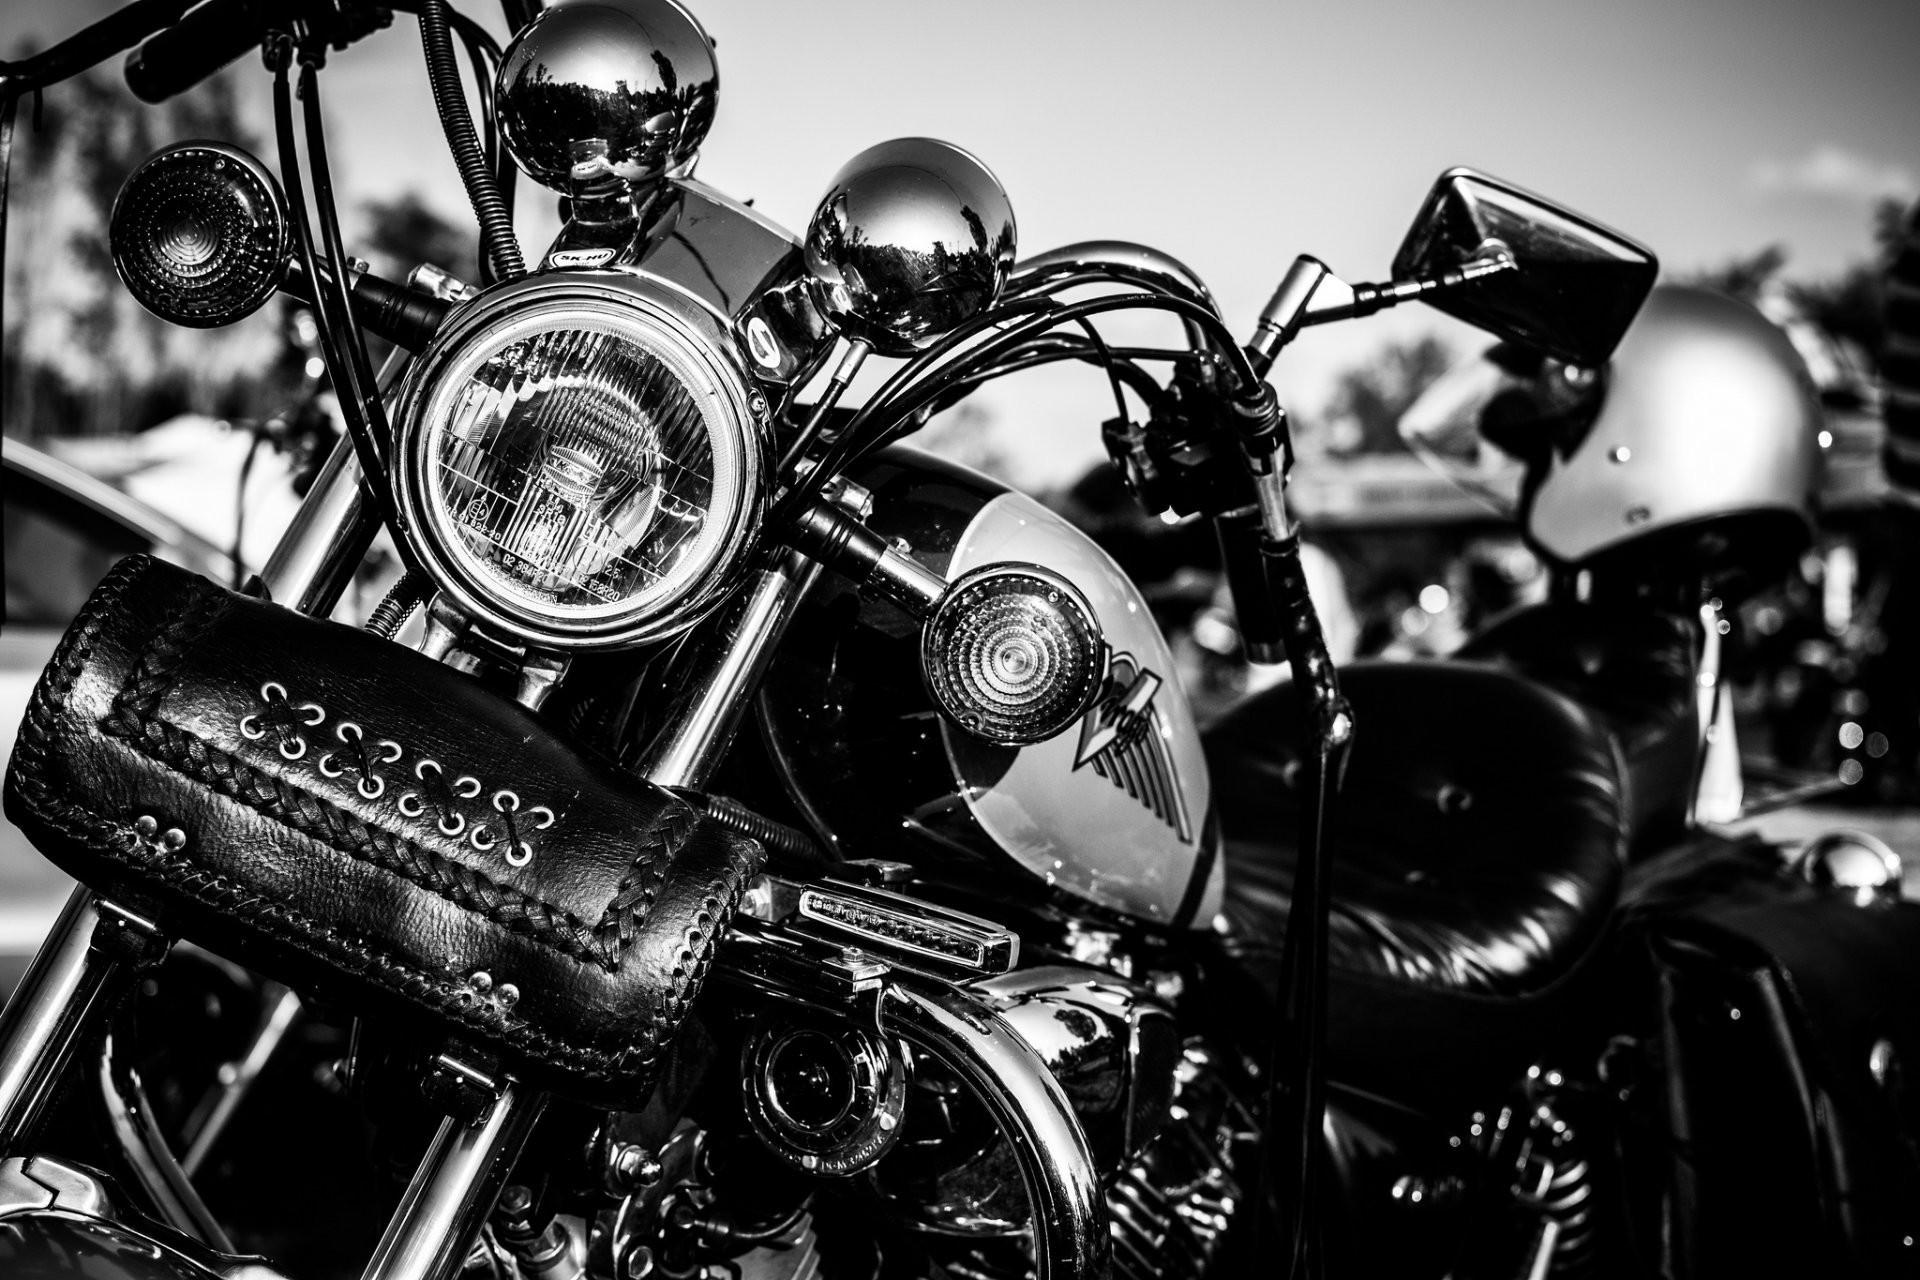 motorcycle leather handbag white and black lights metal chrome